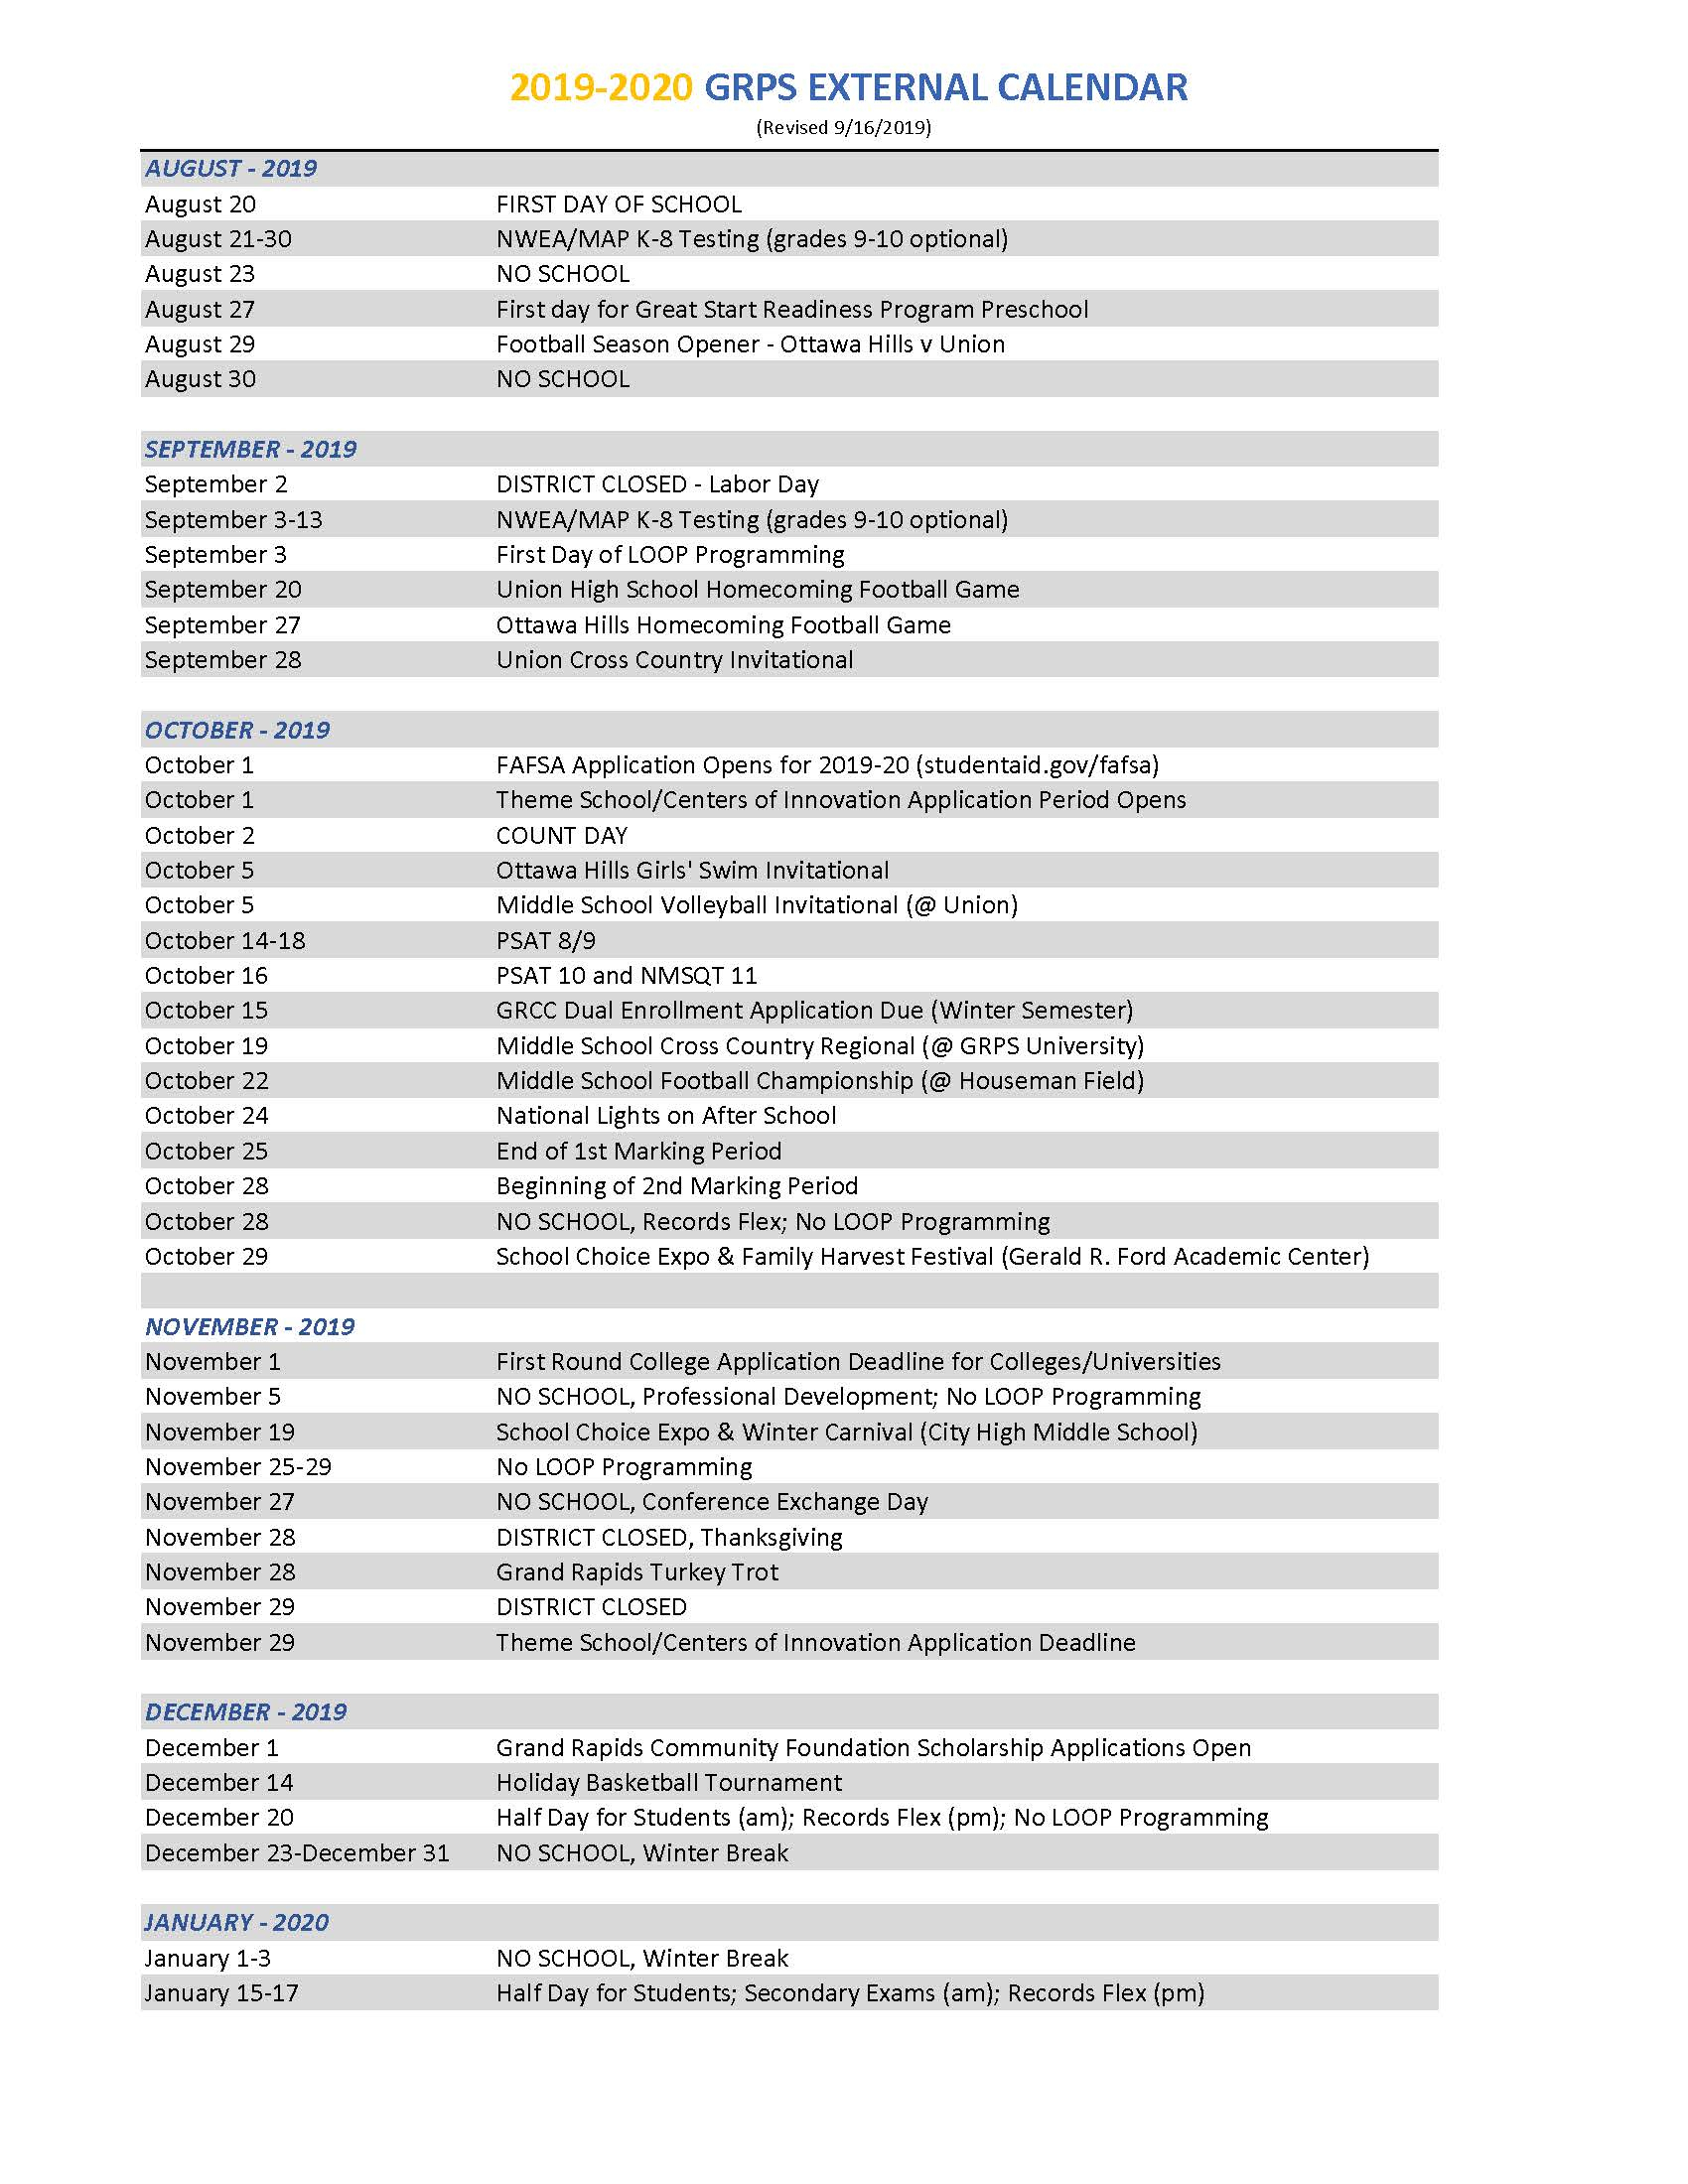 2019-2020 District Calendar pertaining to Grand Rapids High School Calendar